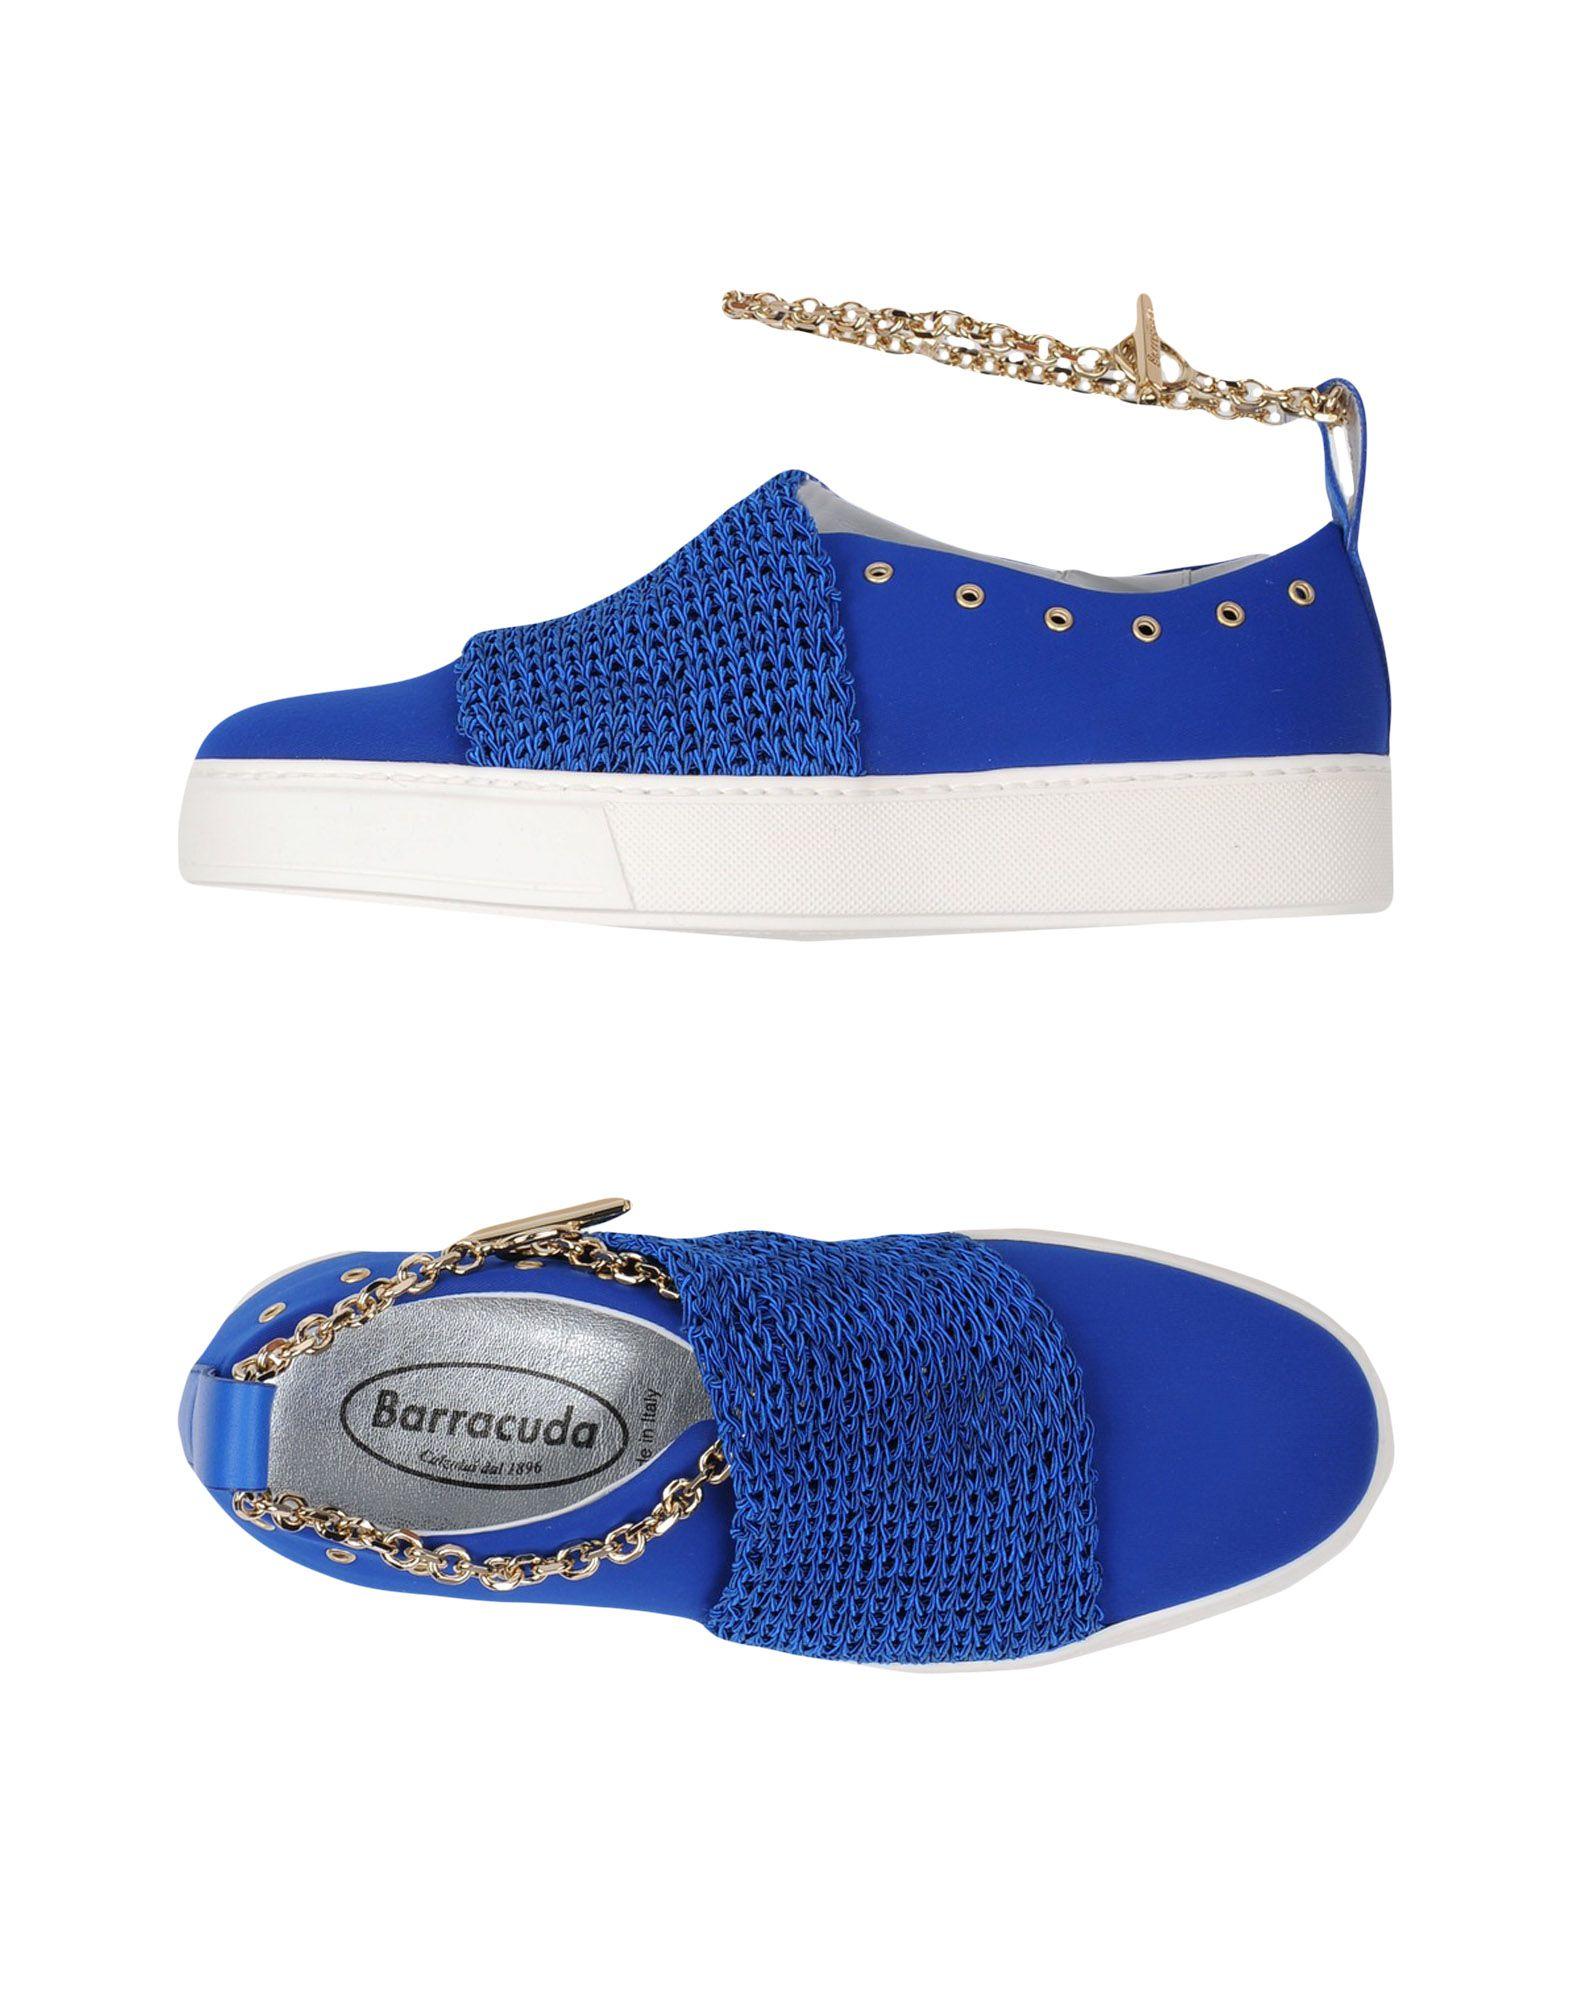 Moda Sneakers Sneakers Moda Barracuda Donna - 11415985NT bf4405